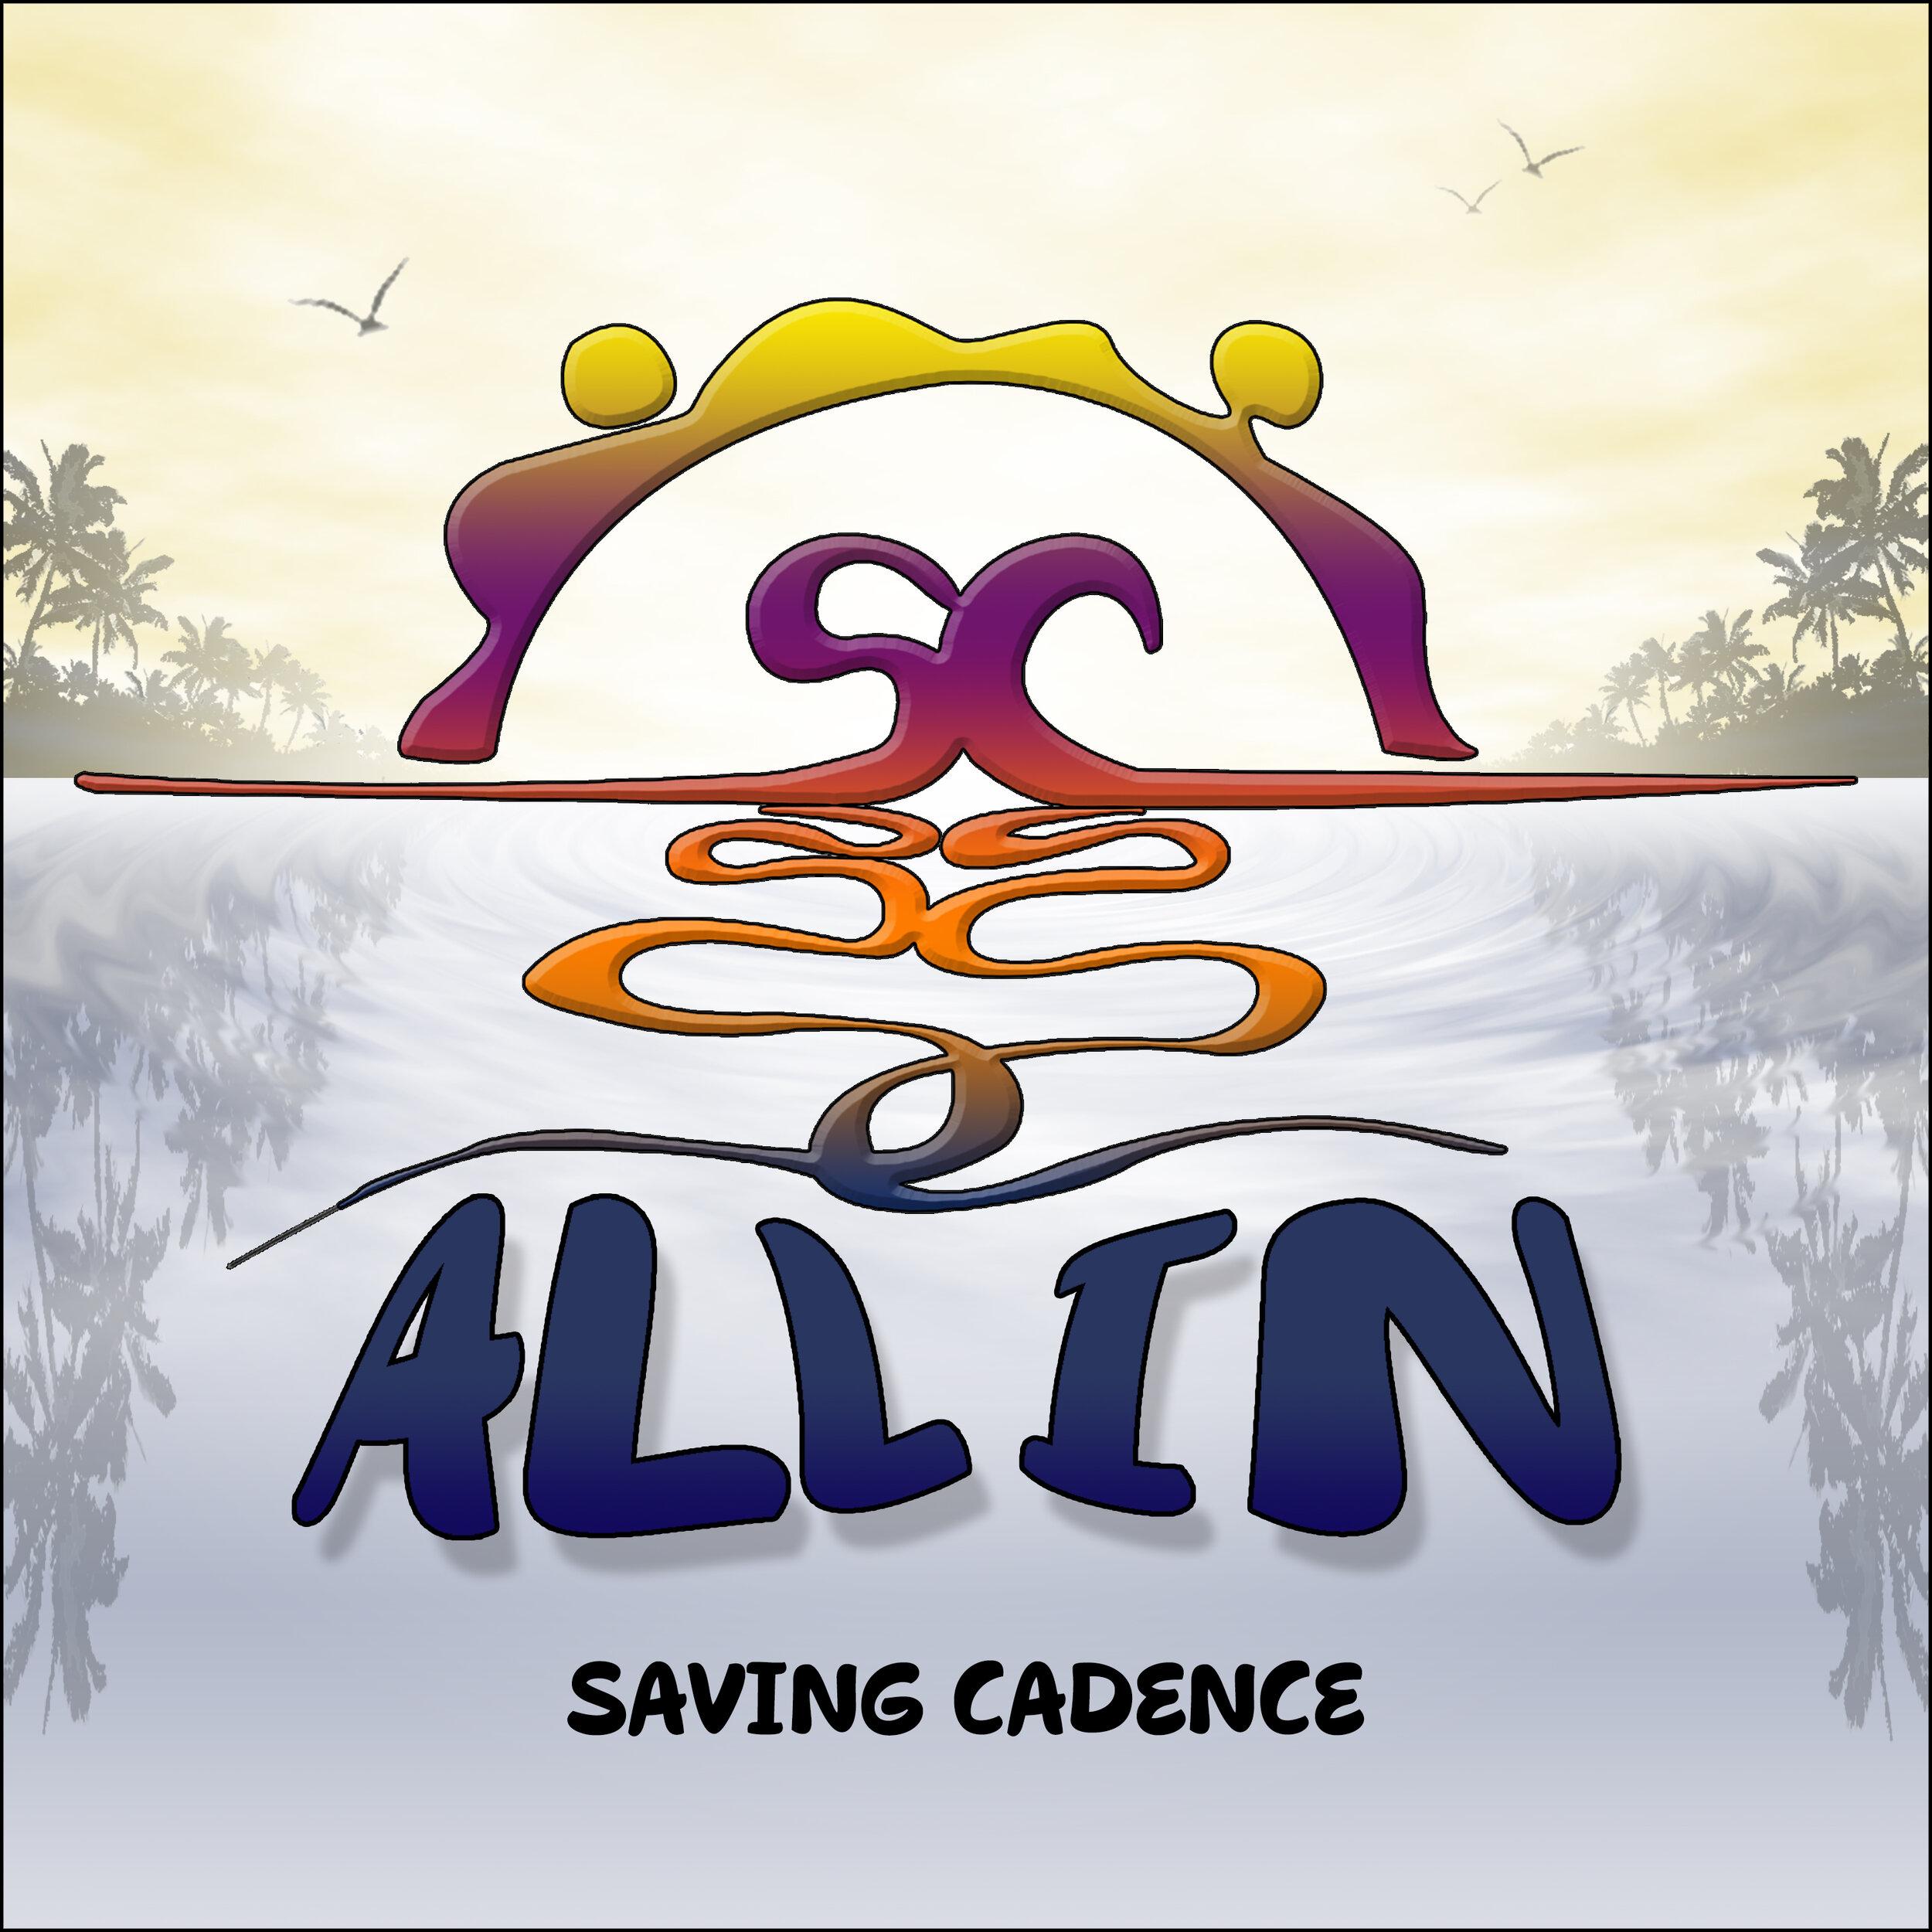 All In - Single Art - Saving Cadence - 2019